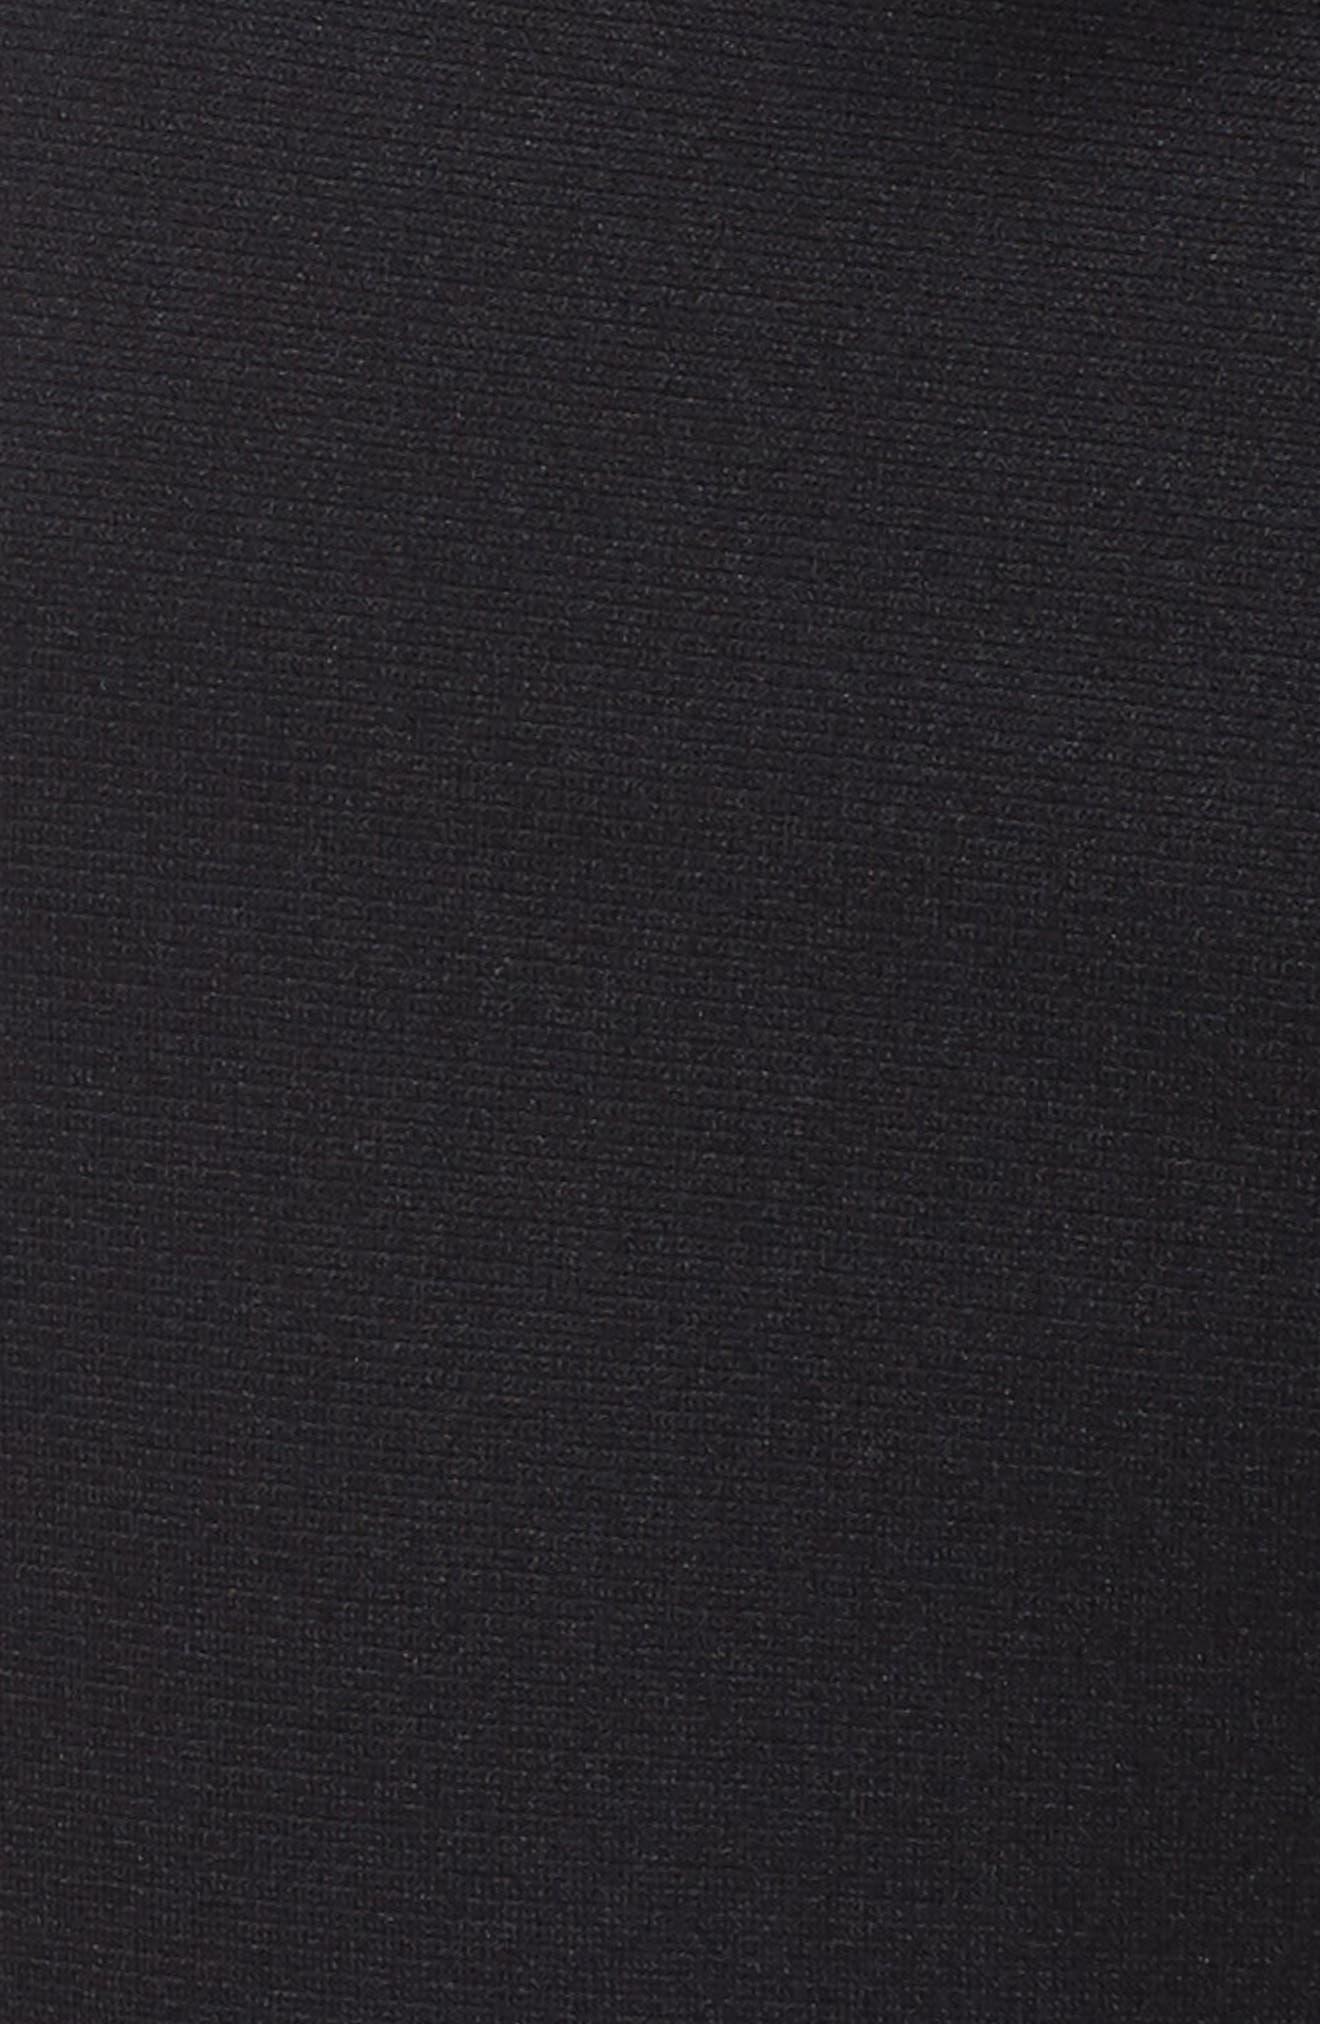 UNDER ARMOUR,                             Sportstyle Knit Jogger Pants,                             Alternate thumbnail 5, color,                             BLACK/ WHITE